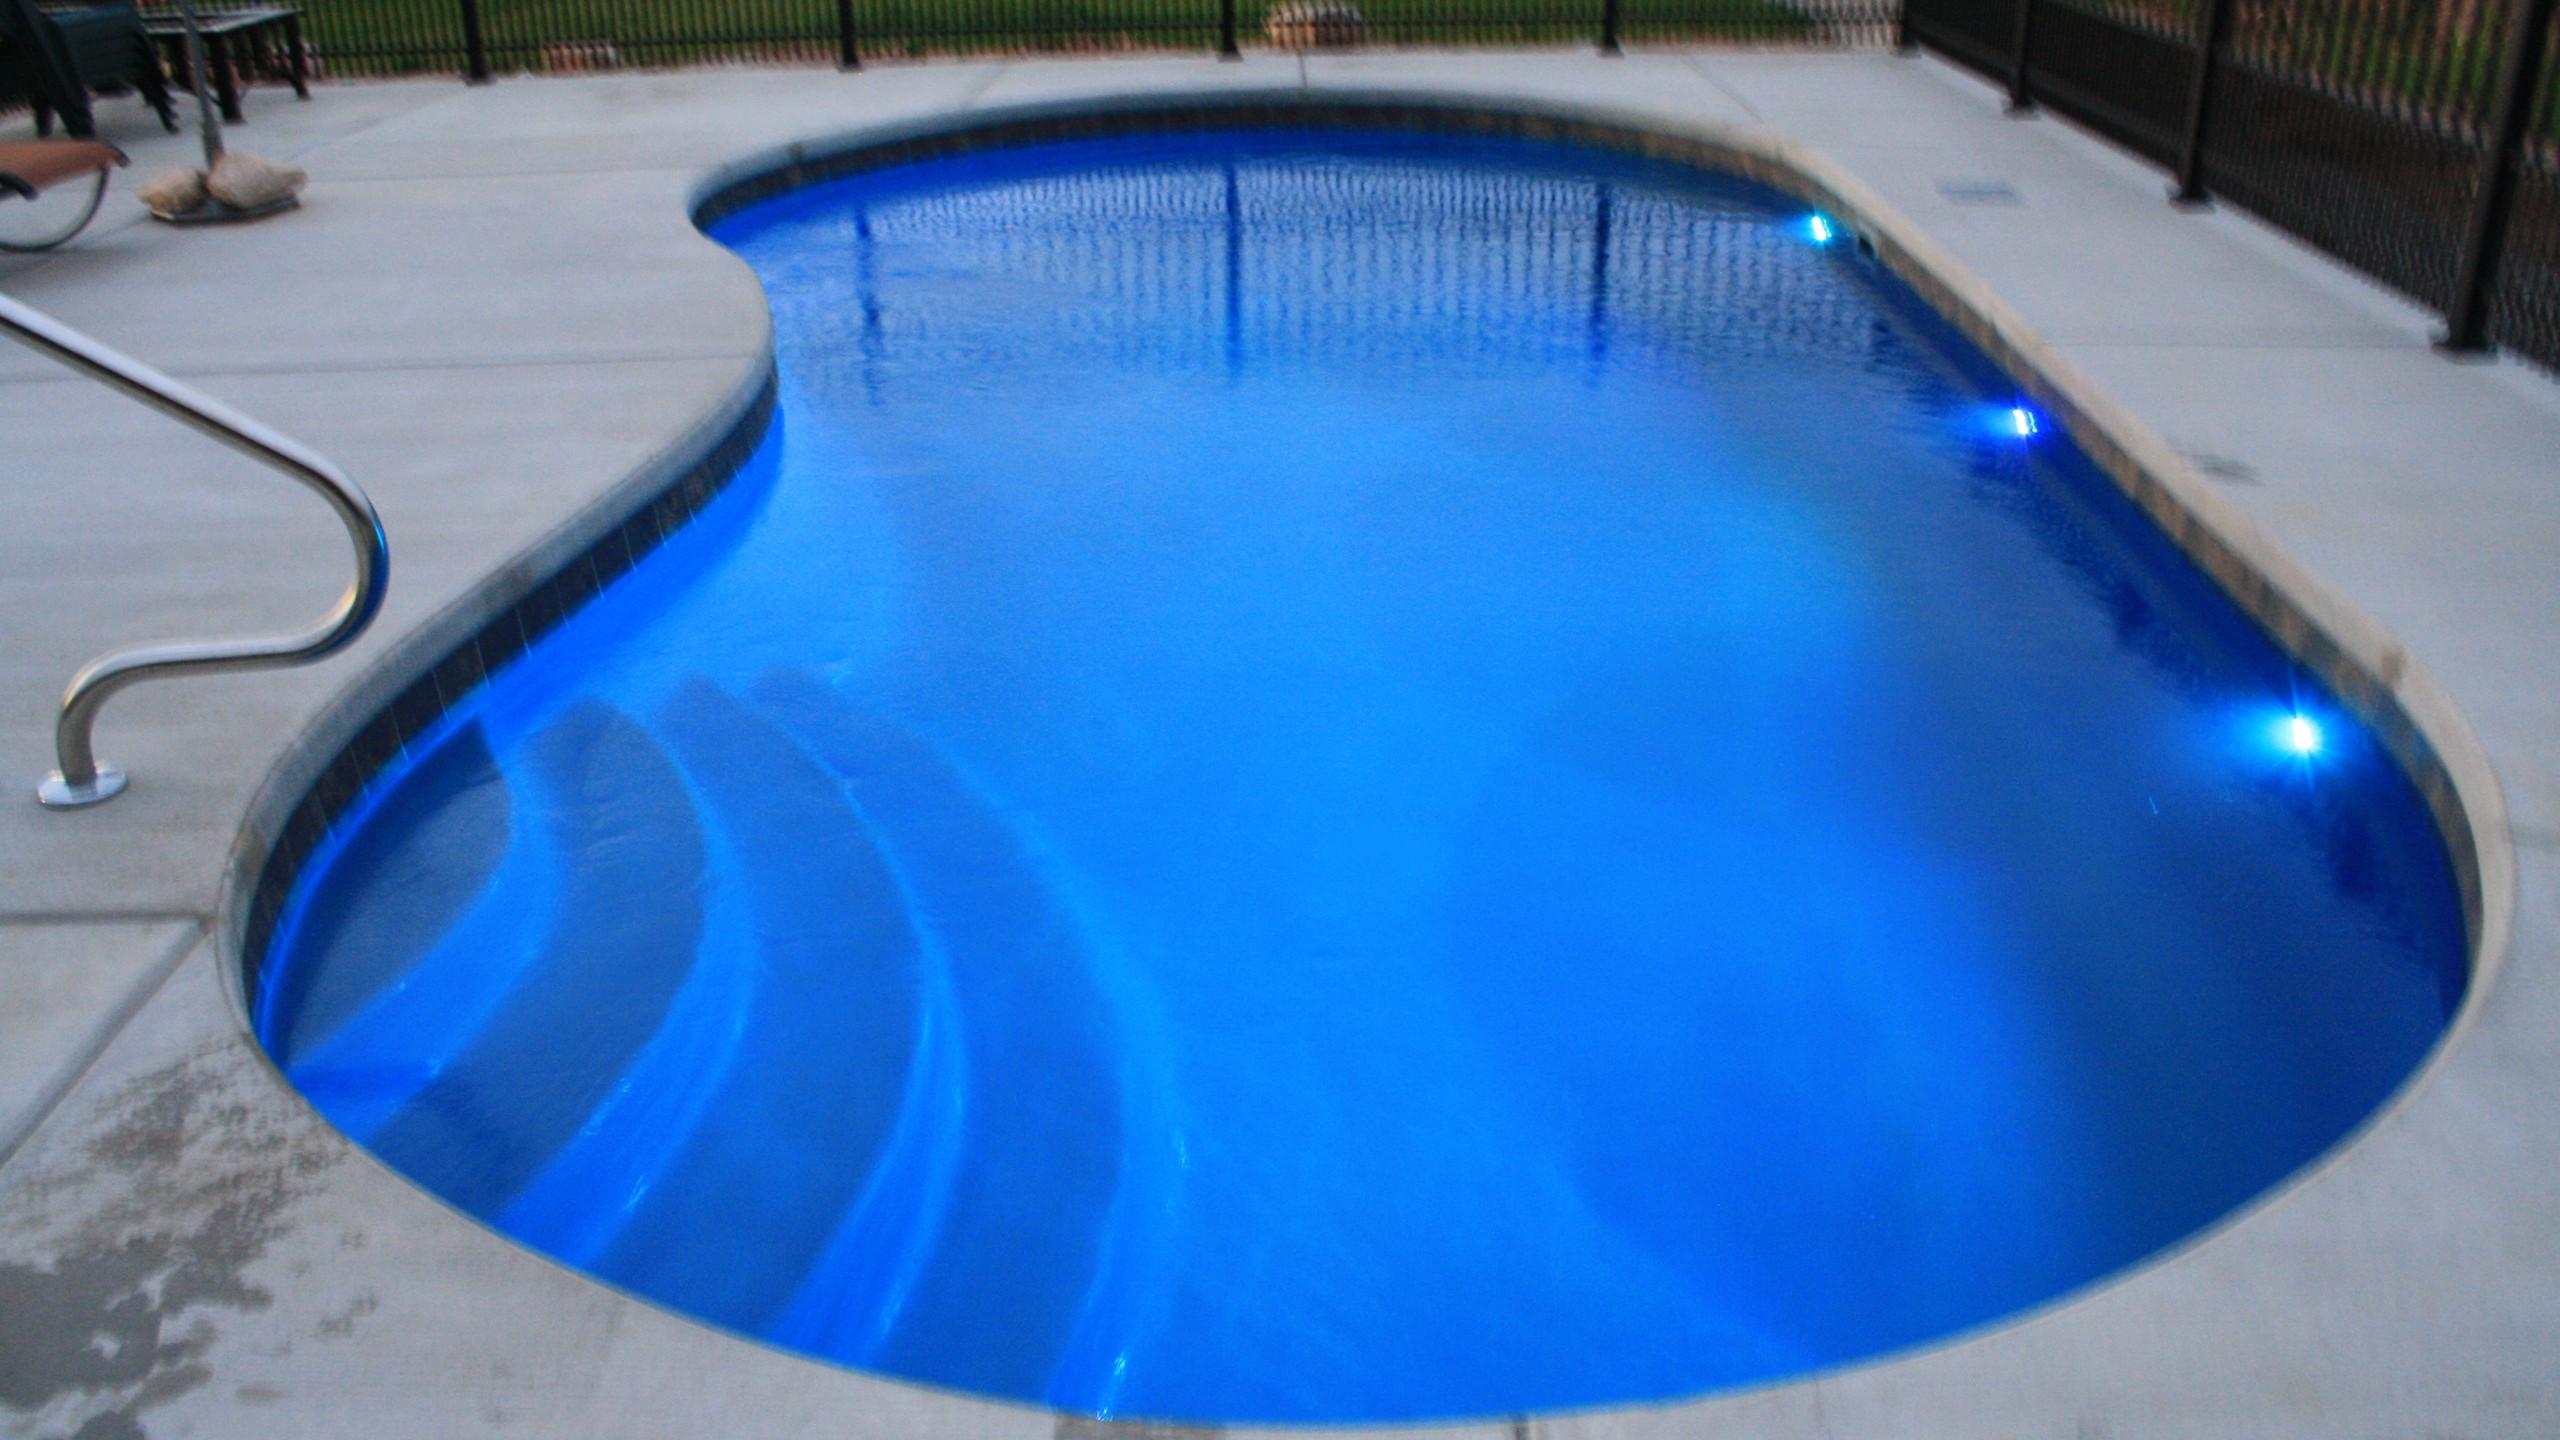 APSP Gold Award for residential fiberglass pool in Greenleaf WI